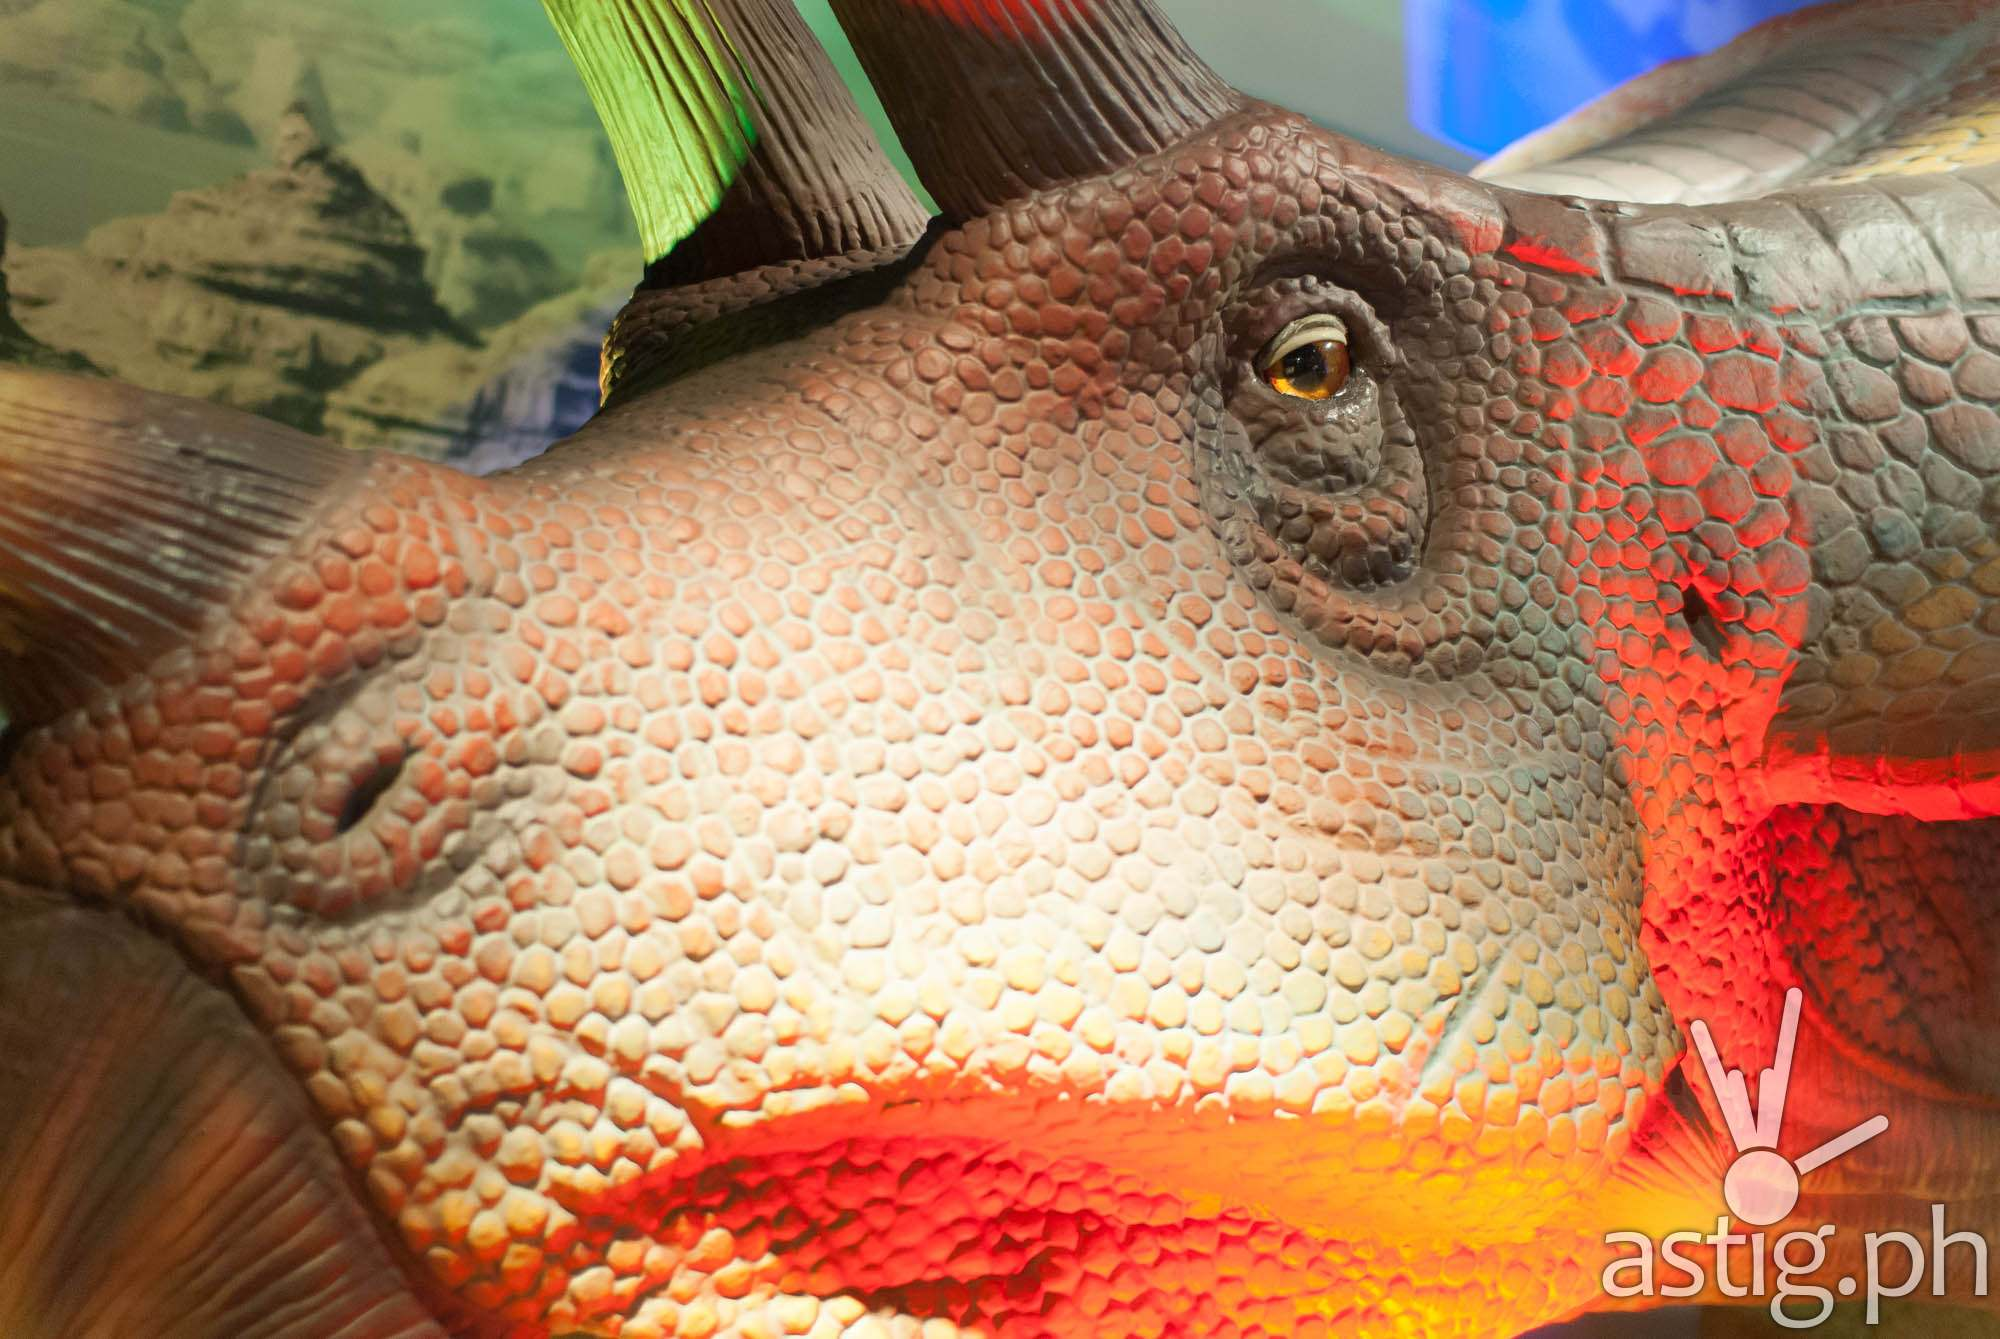 Triceratops - Dinosaurs Around The World exhibit - Mind Museum BGC